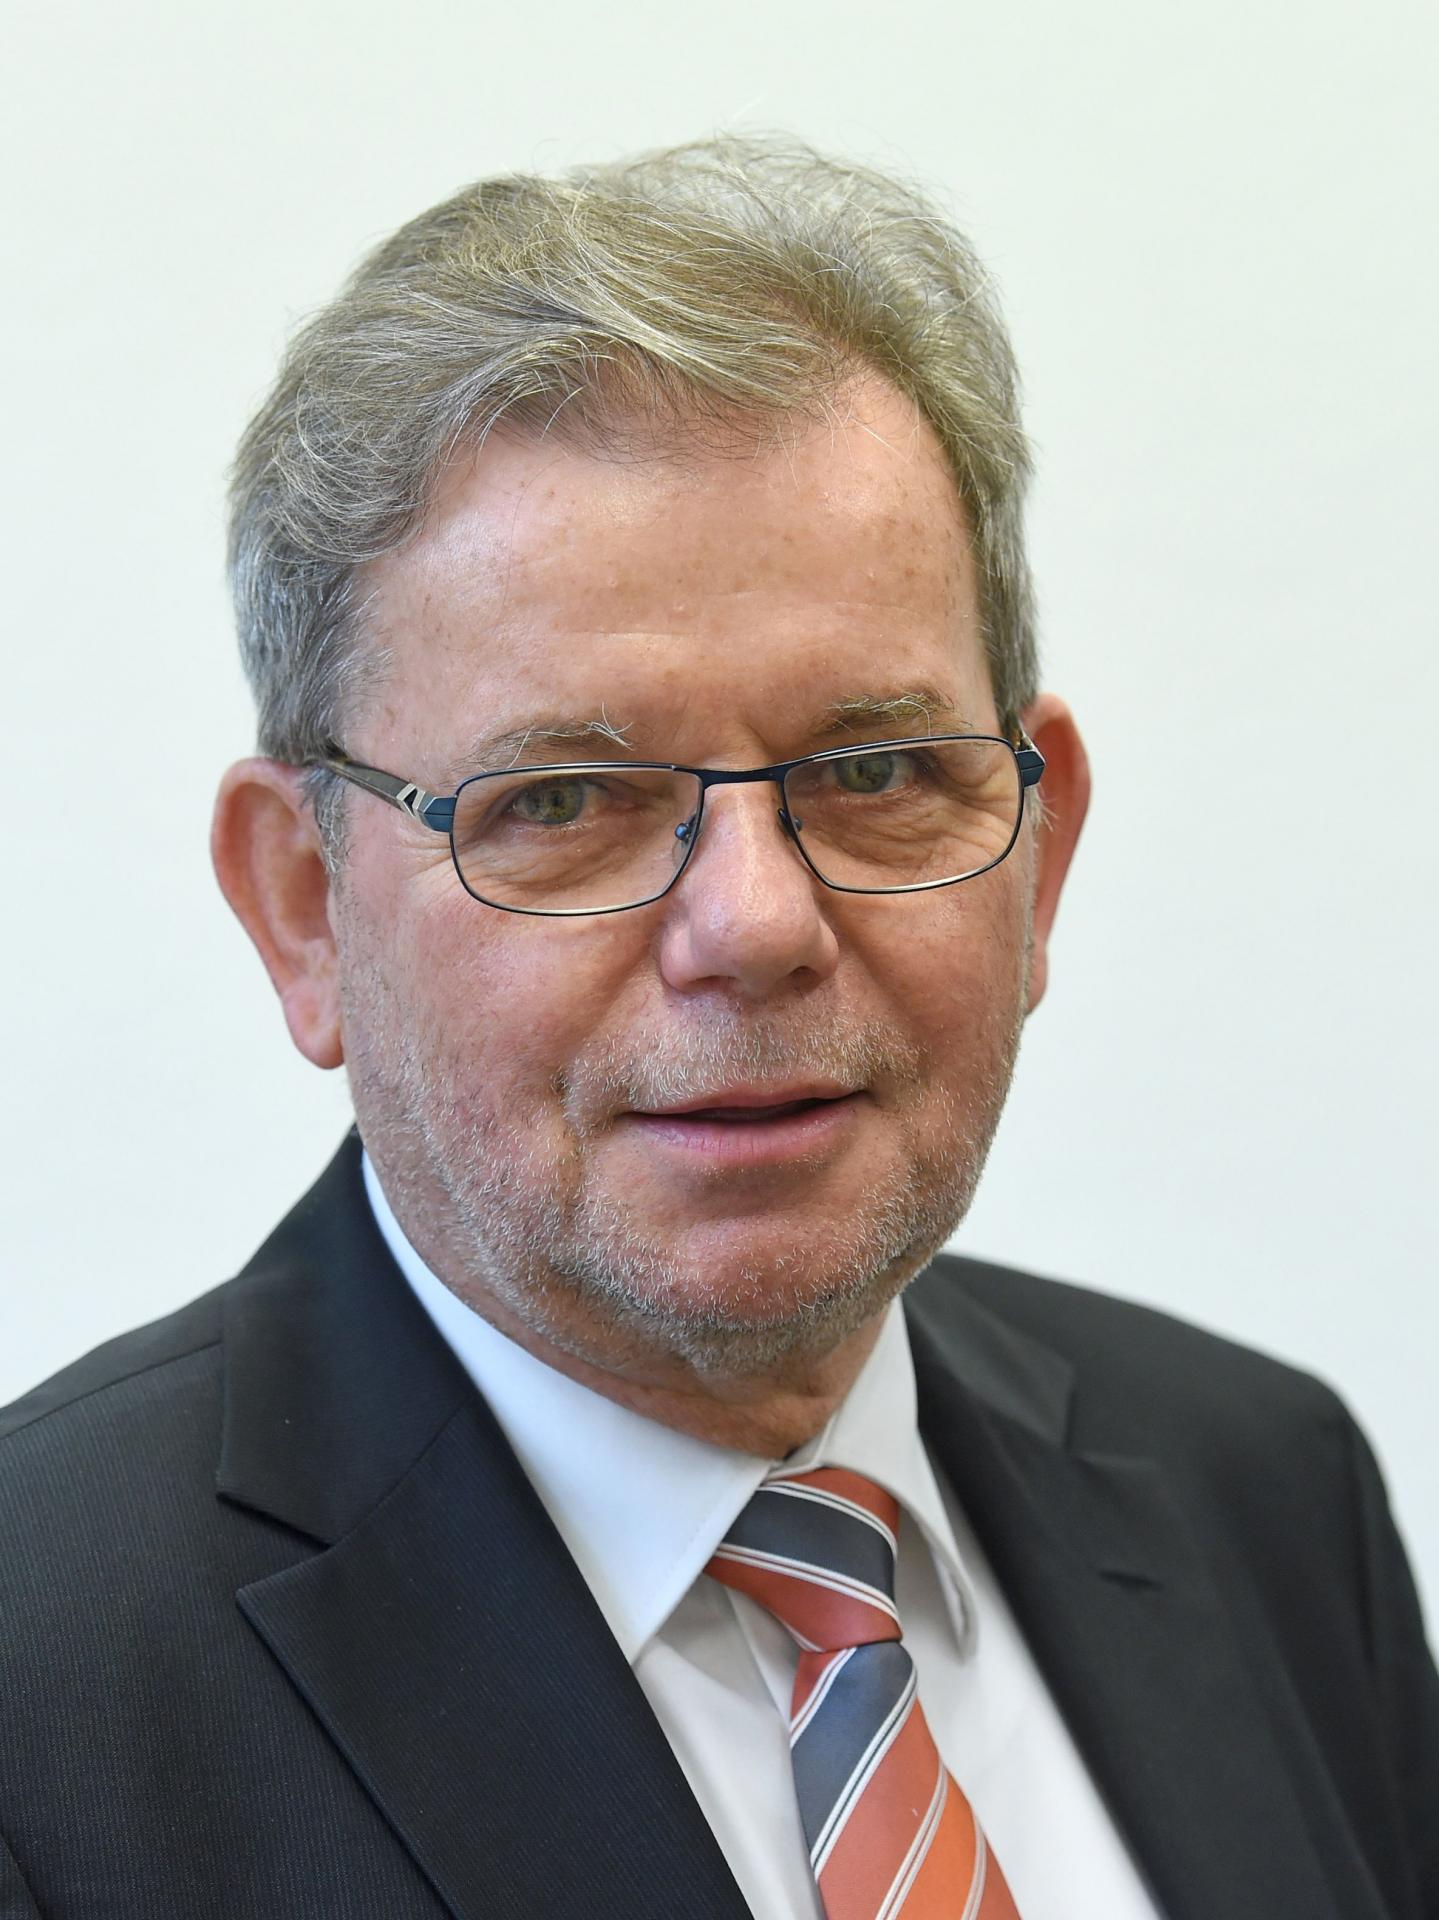 Horst Schiesgeries